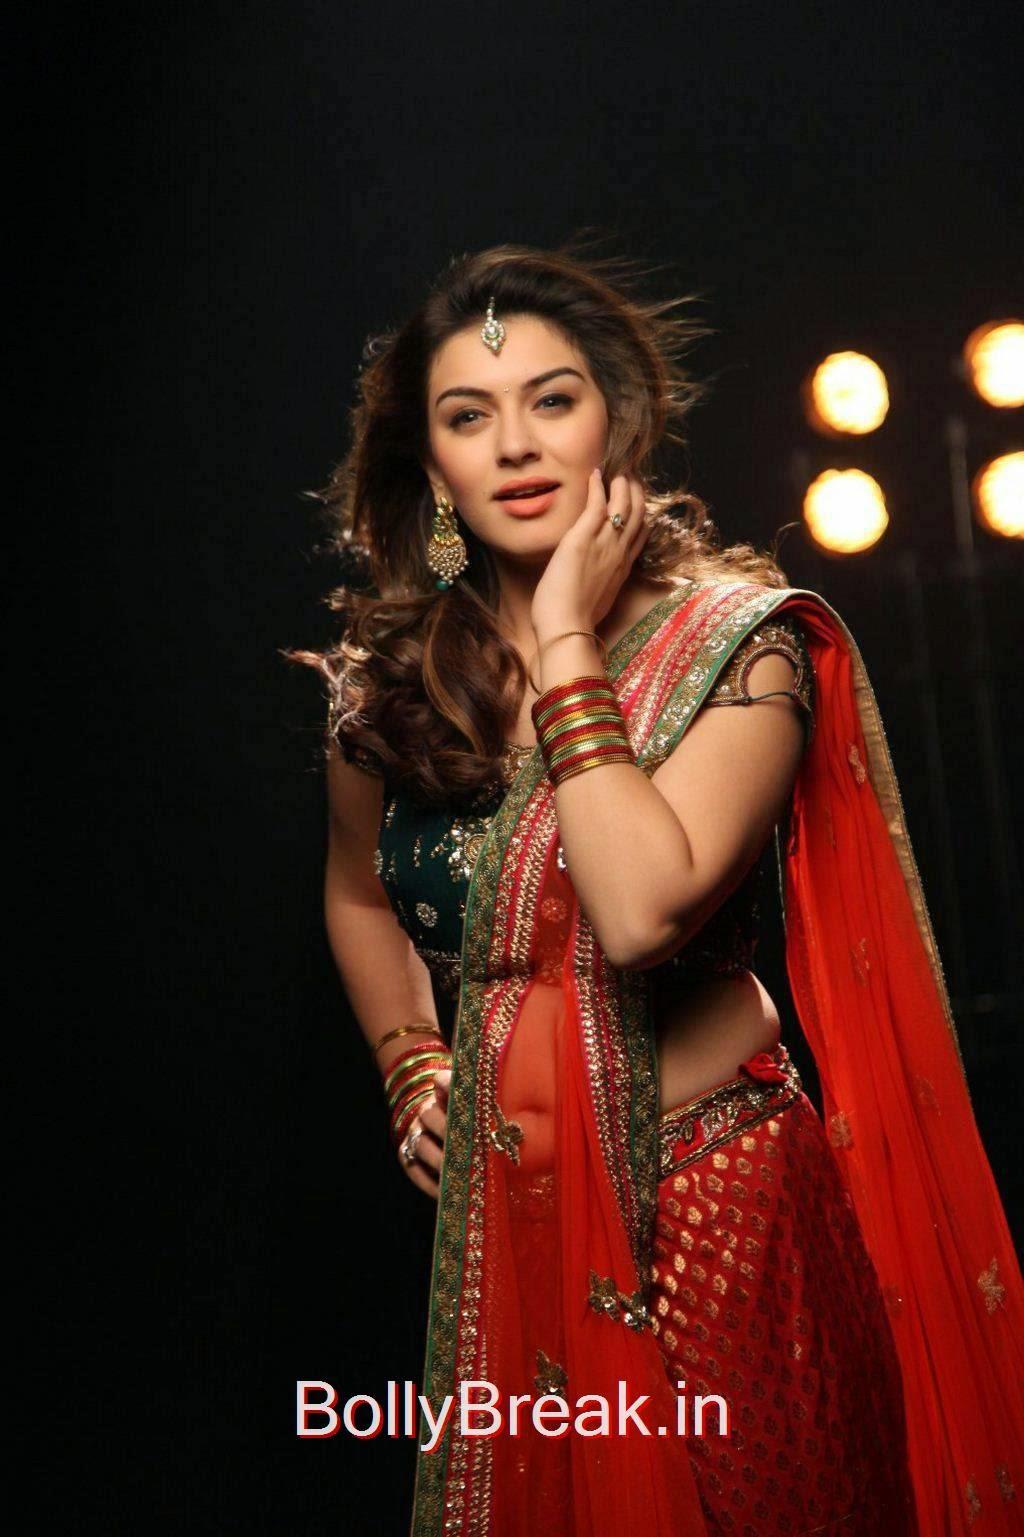 Telugu Actress Hansika, Hot HD Pics of Hansika Motwani in Saree From Romeo Juliet Movie